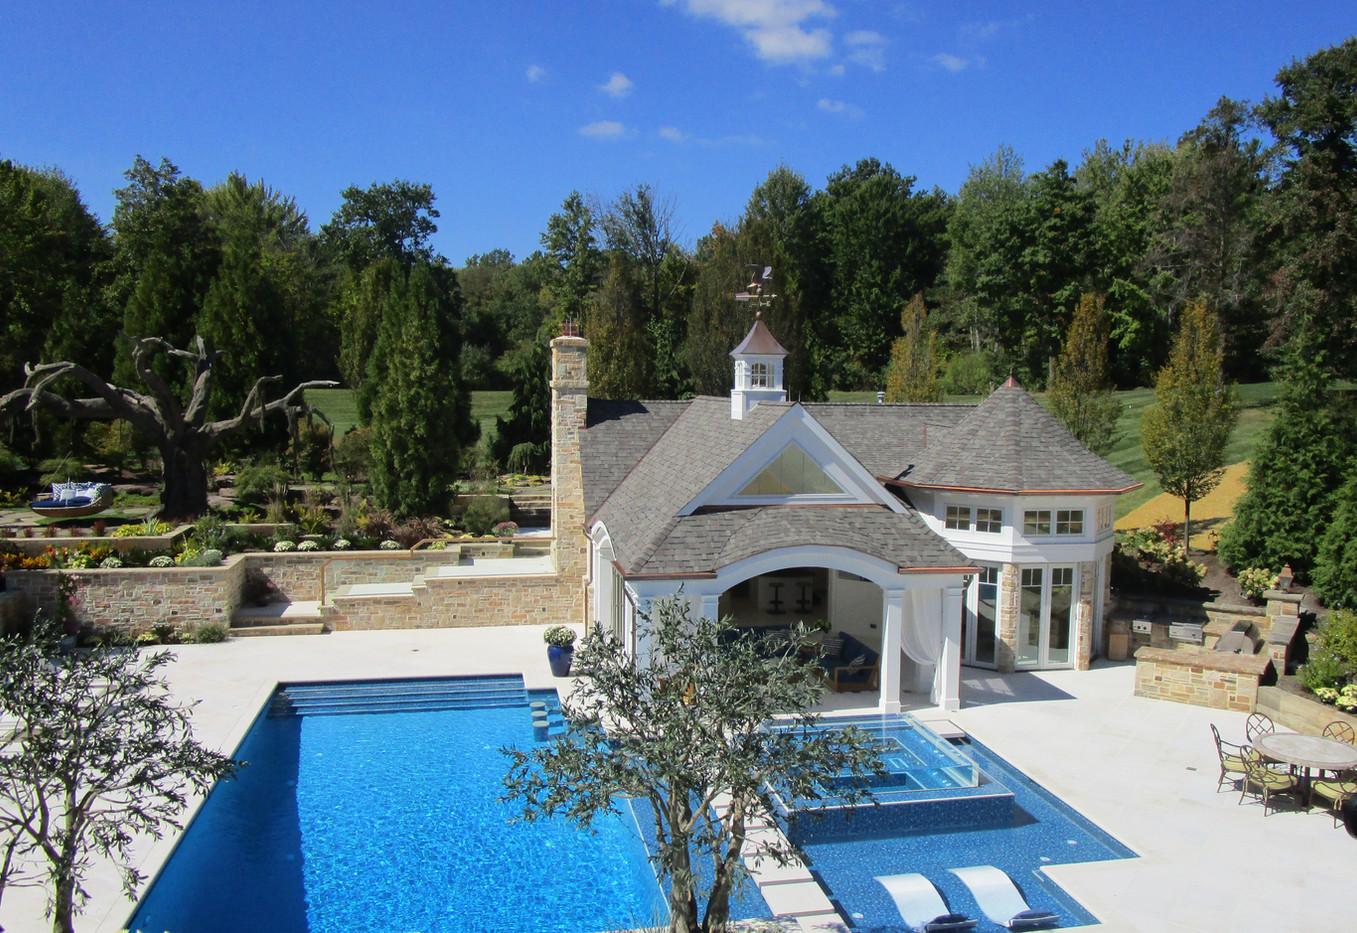 Pool House Resort